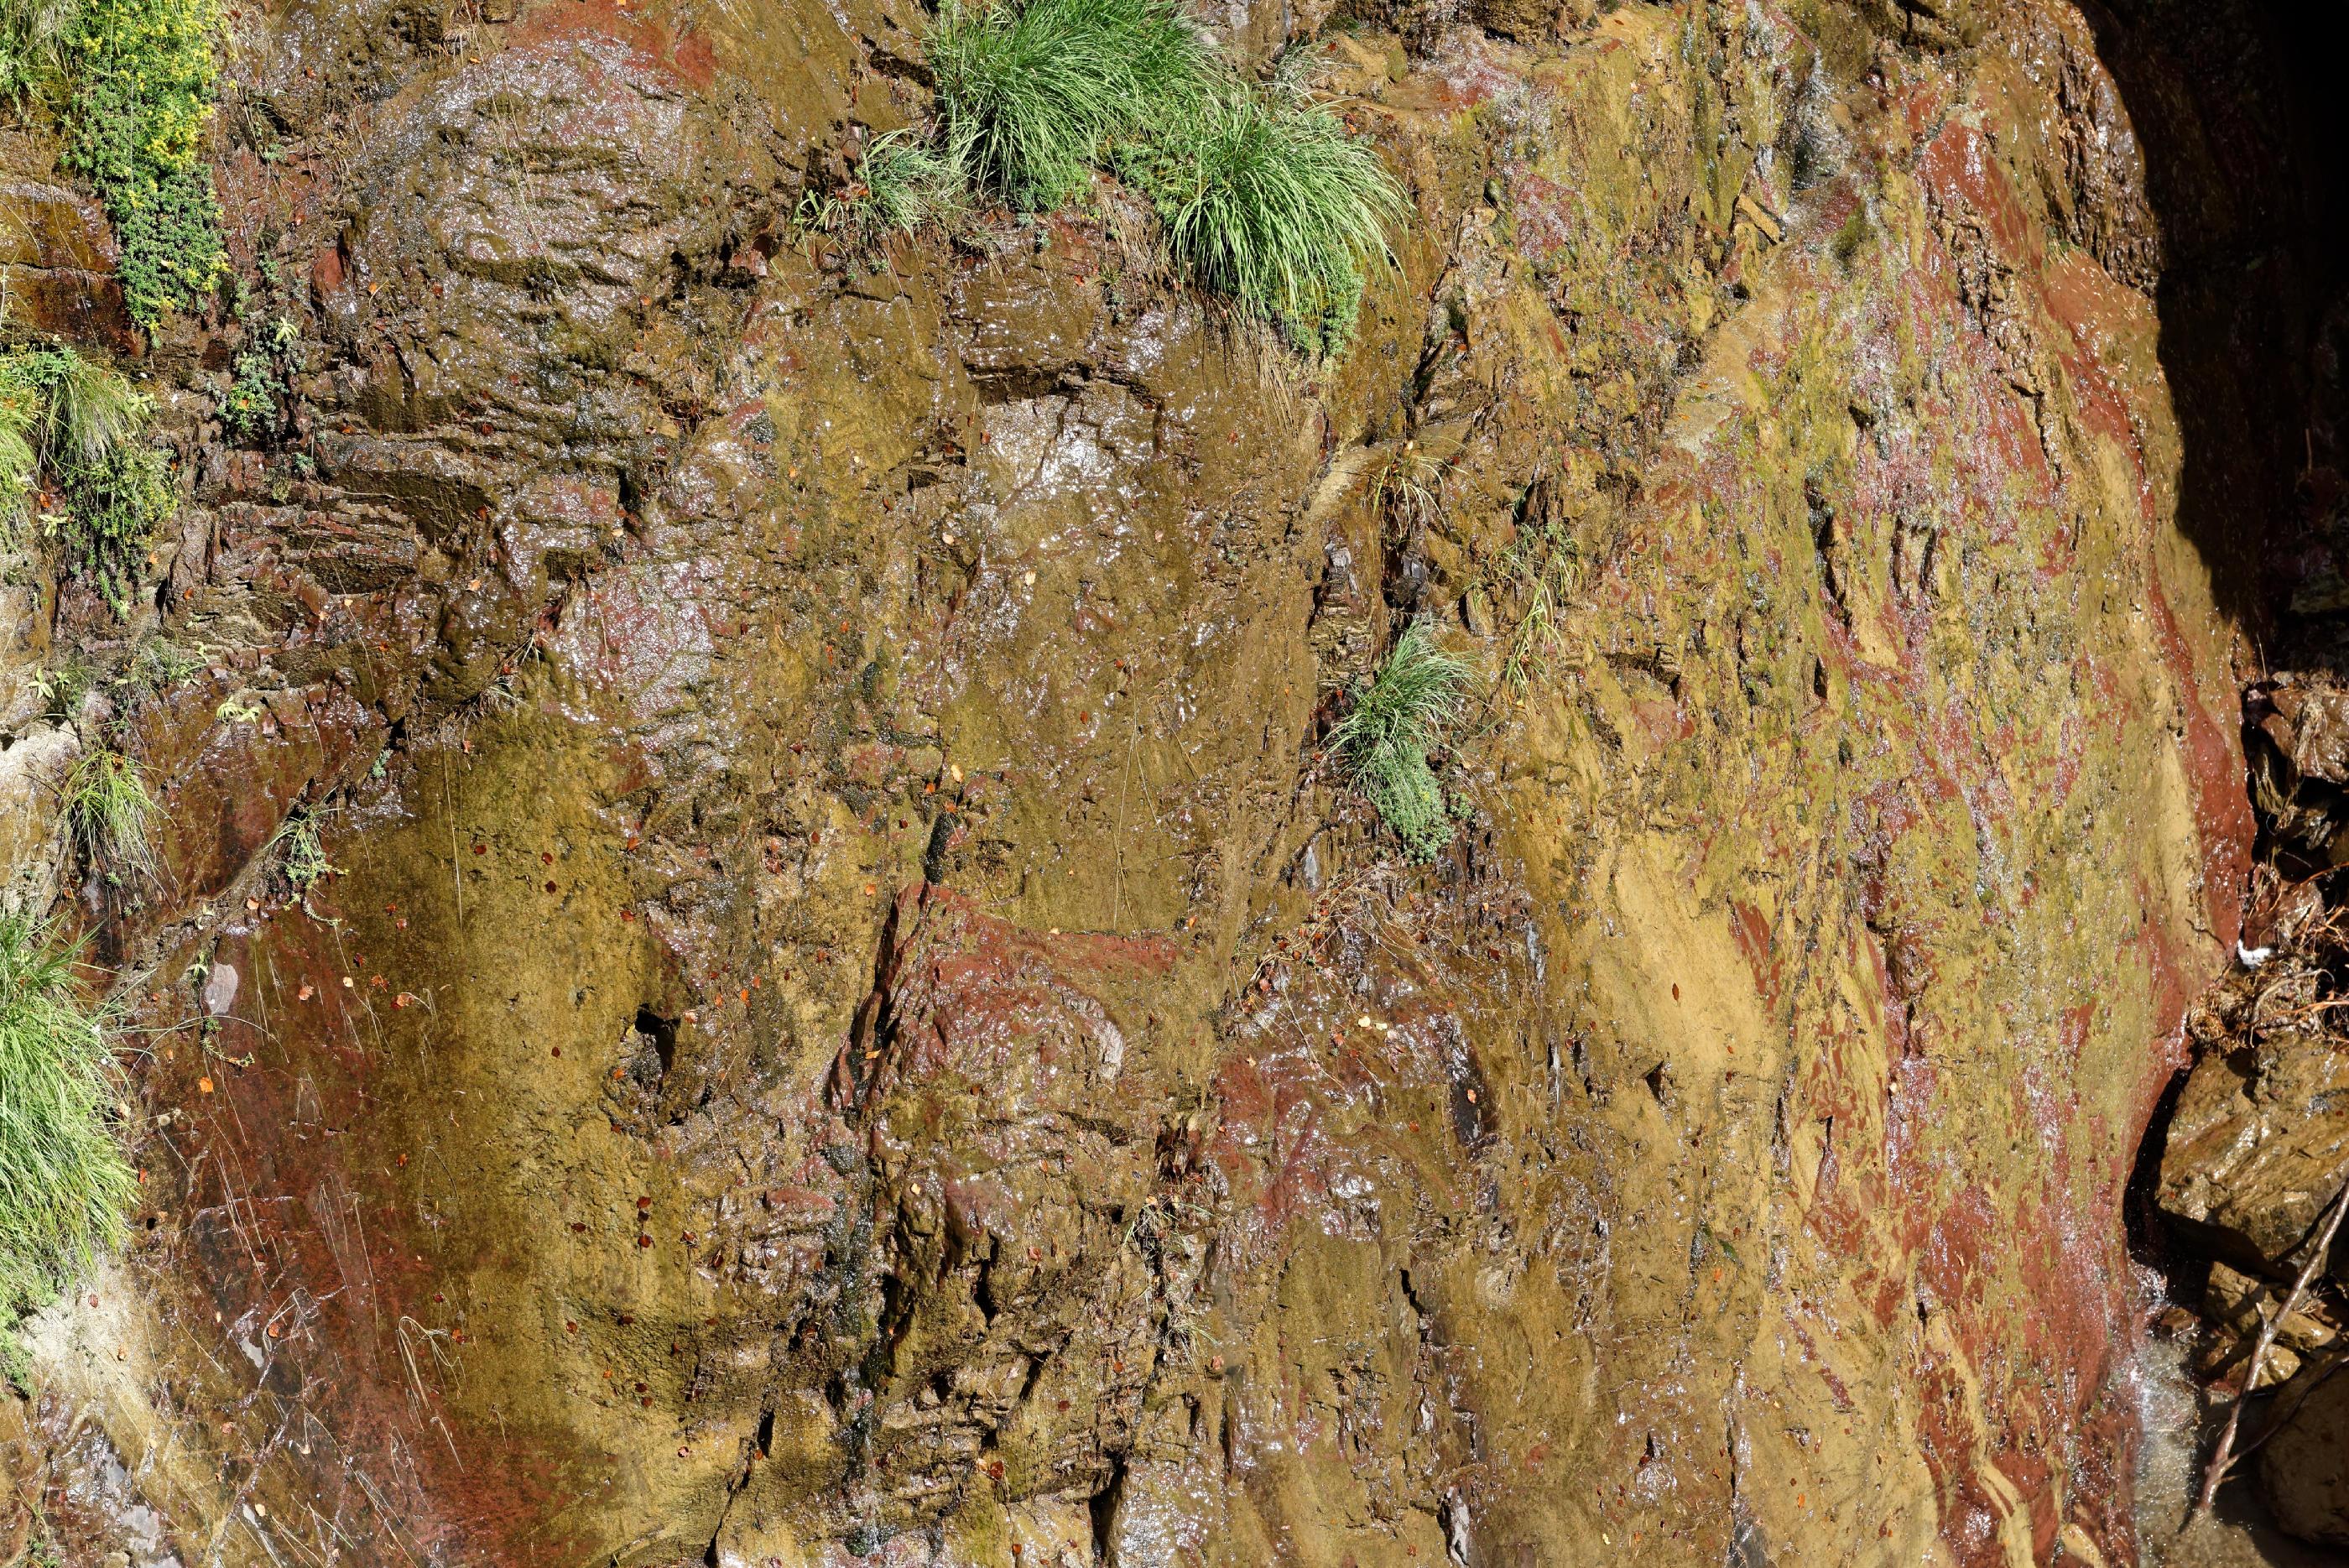 160910-marche-cascade-du-cinca-et-de-la-larri-sobrarbe-aragon-200